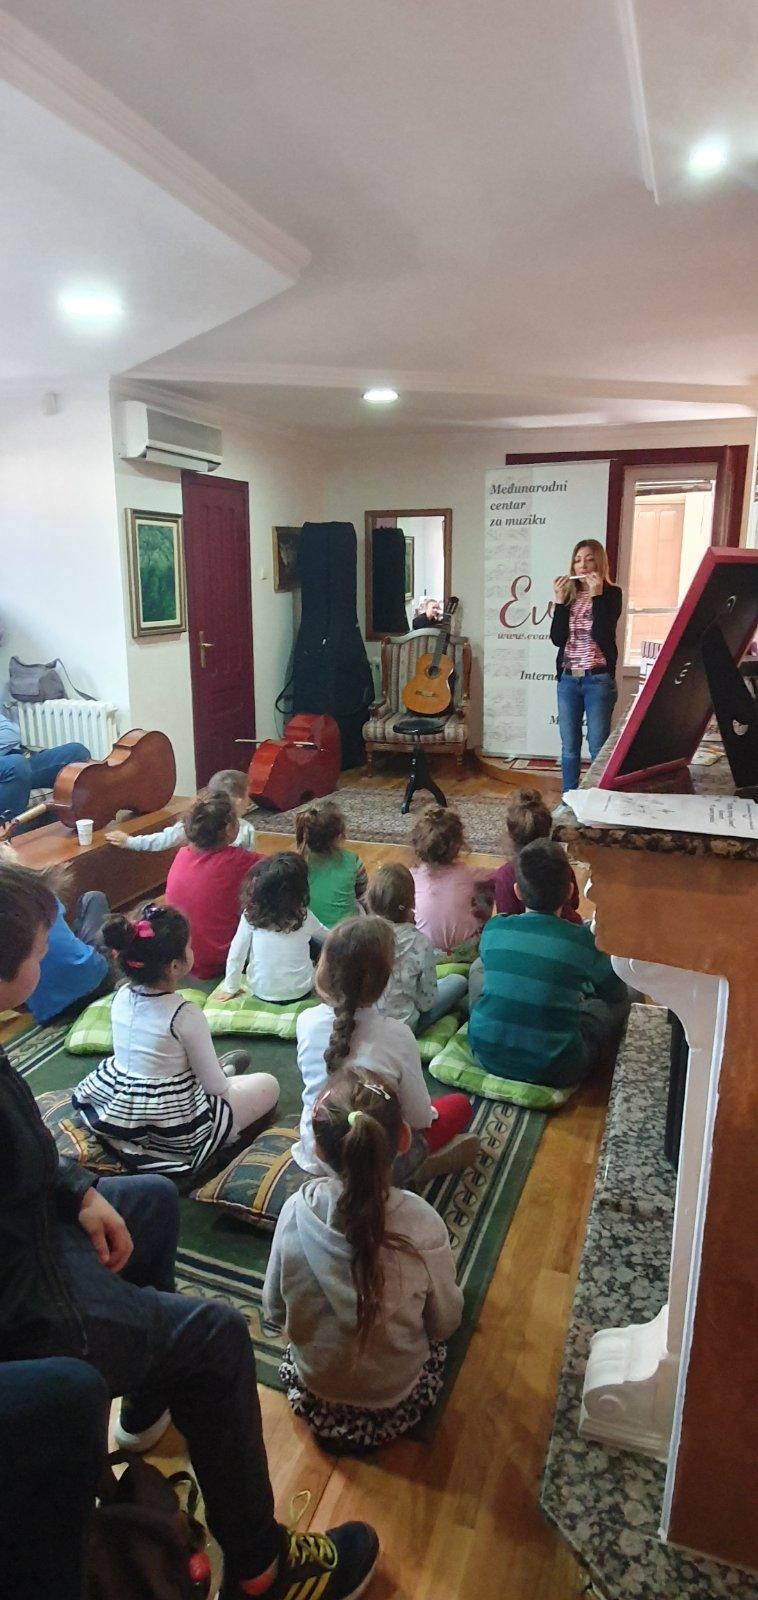 casovi-flaute-profesorka-saska-predstavlja-deci-instrument-muzicka-skola-eva-music